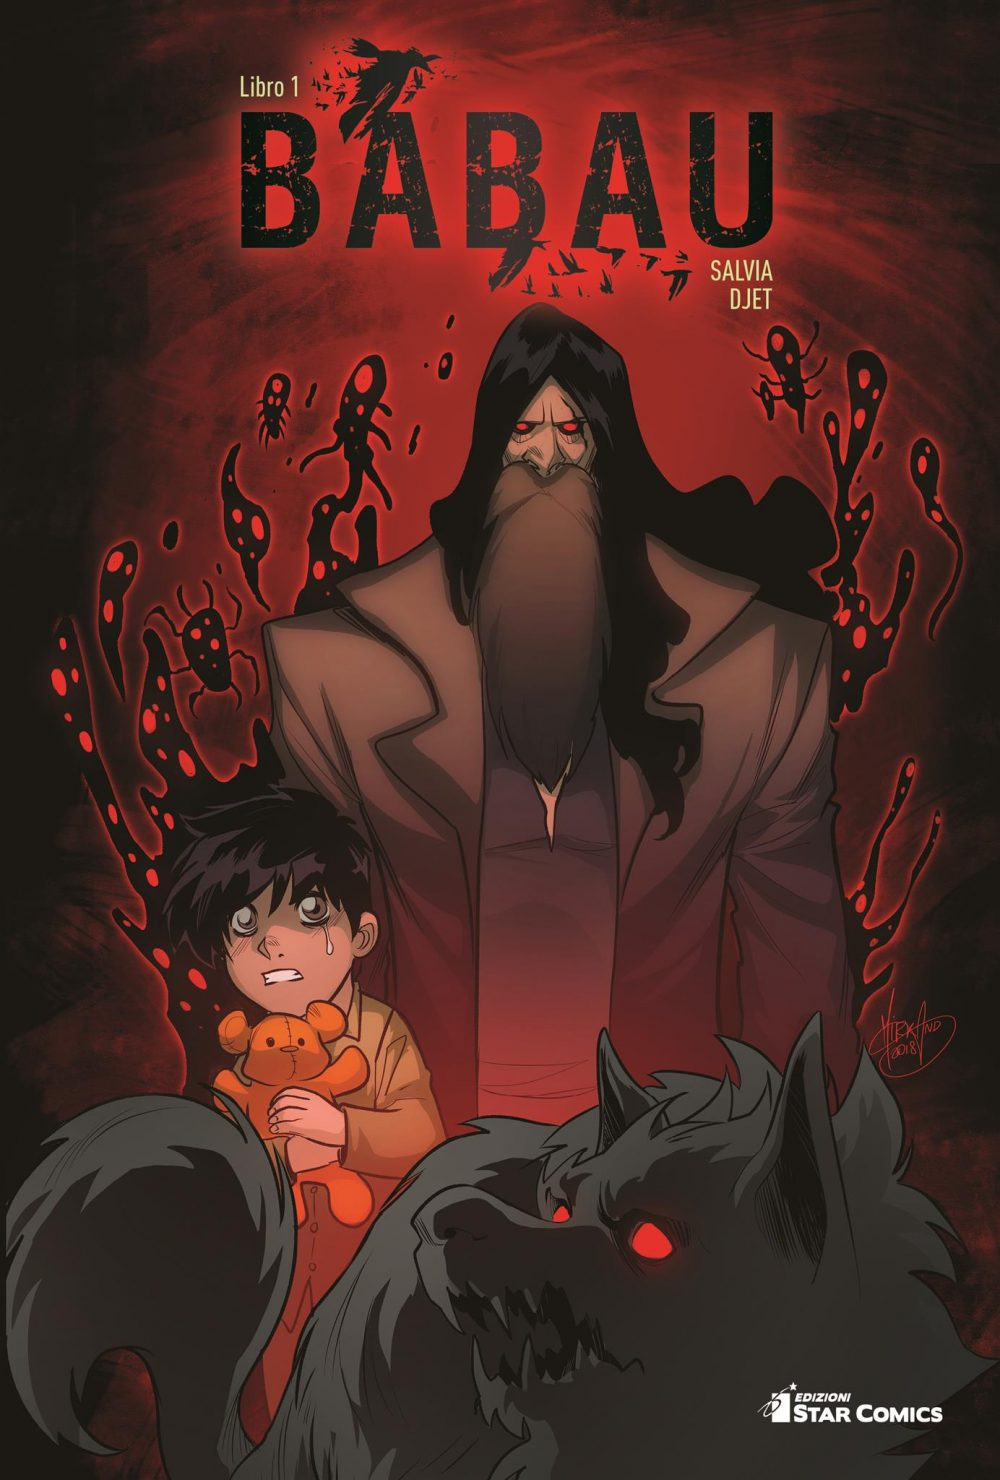 Babau vol. 1, copertina variant di Mirka Andolfo